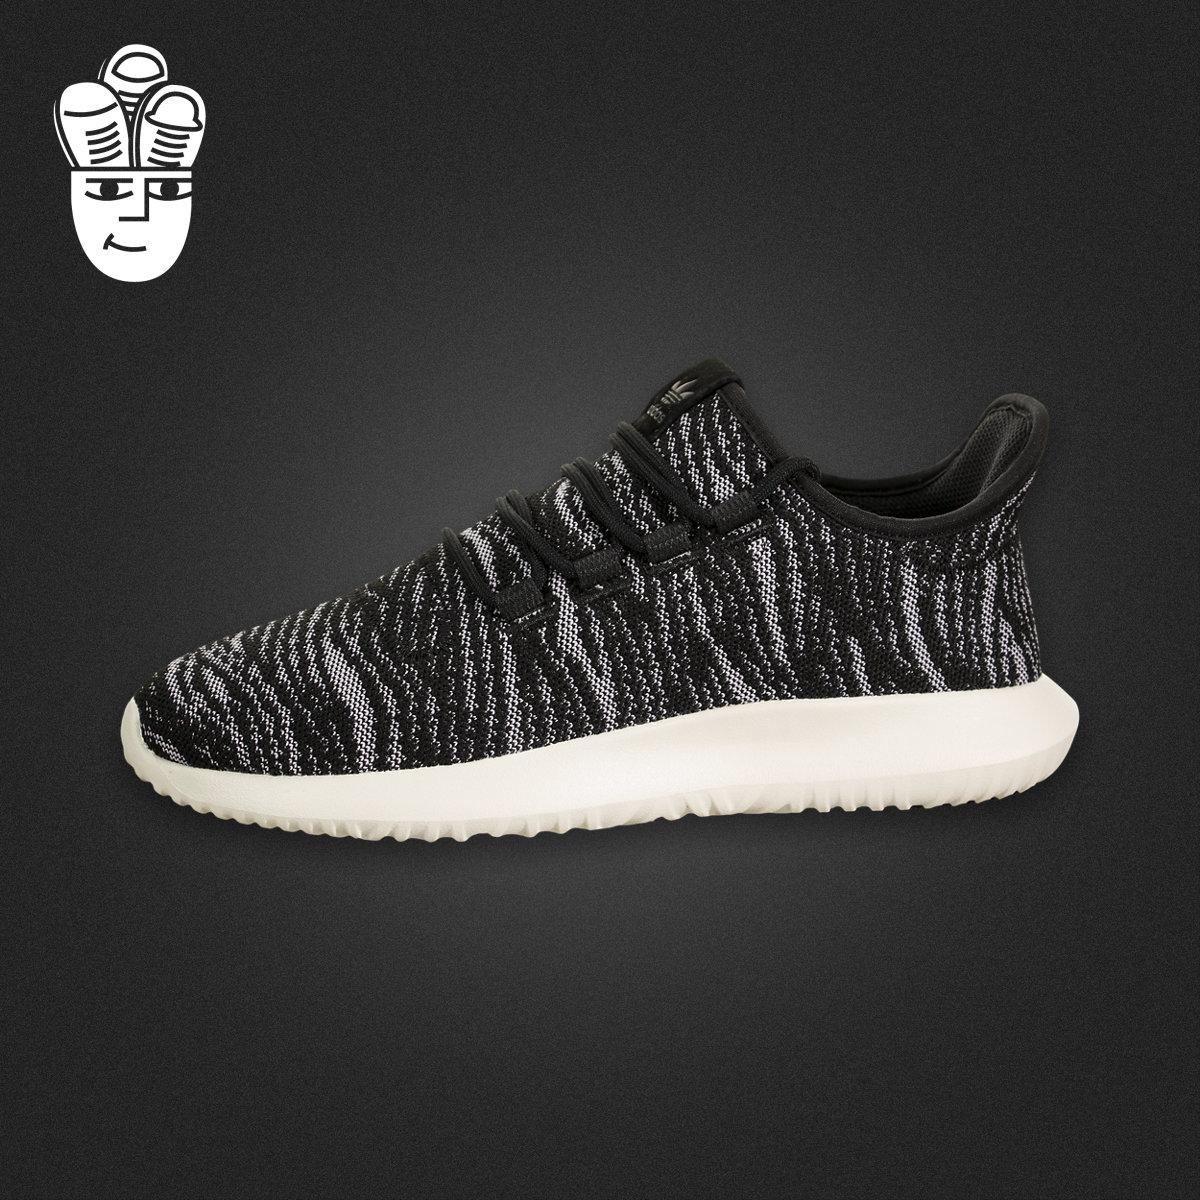 Adidas Tubular Shadow W 阿迪达斯三叶草女鞋 小椰子 时尚休闲鞋